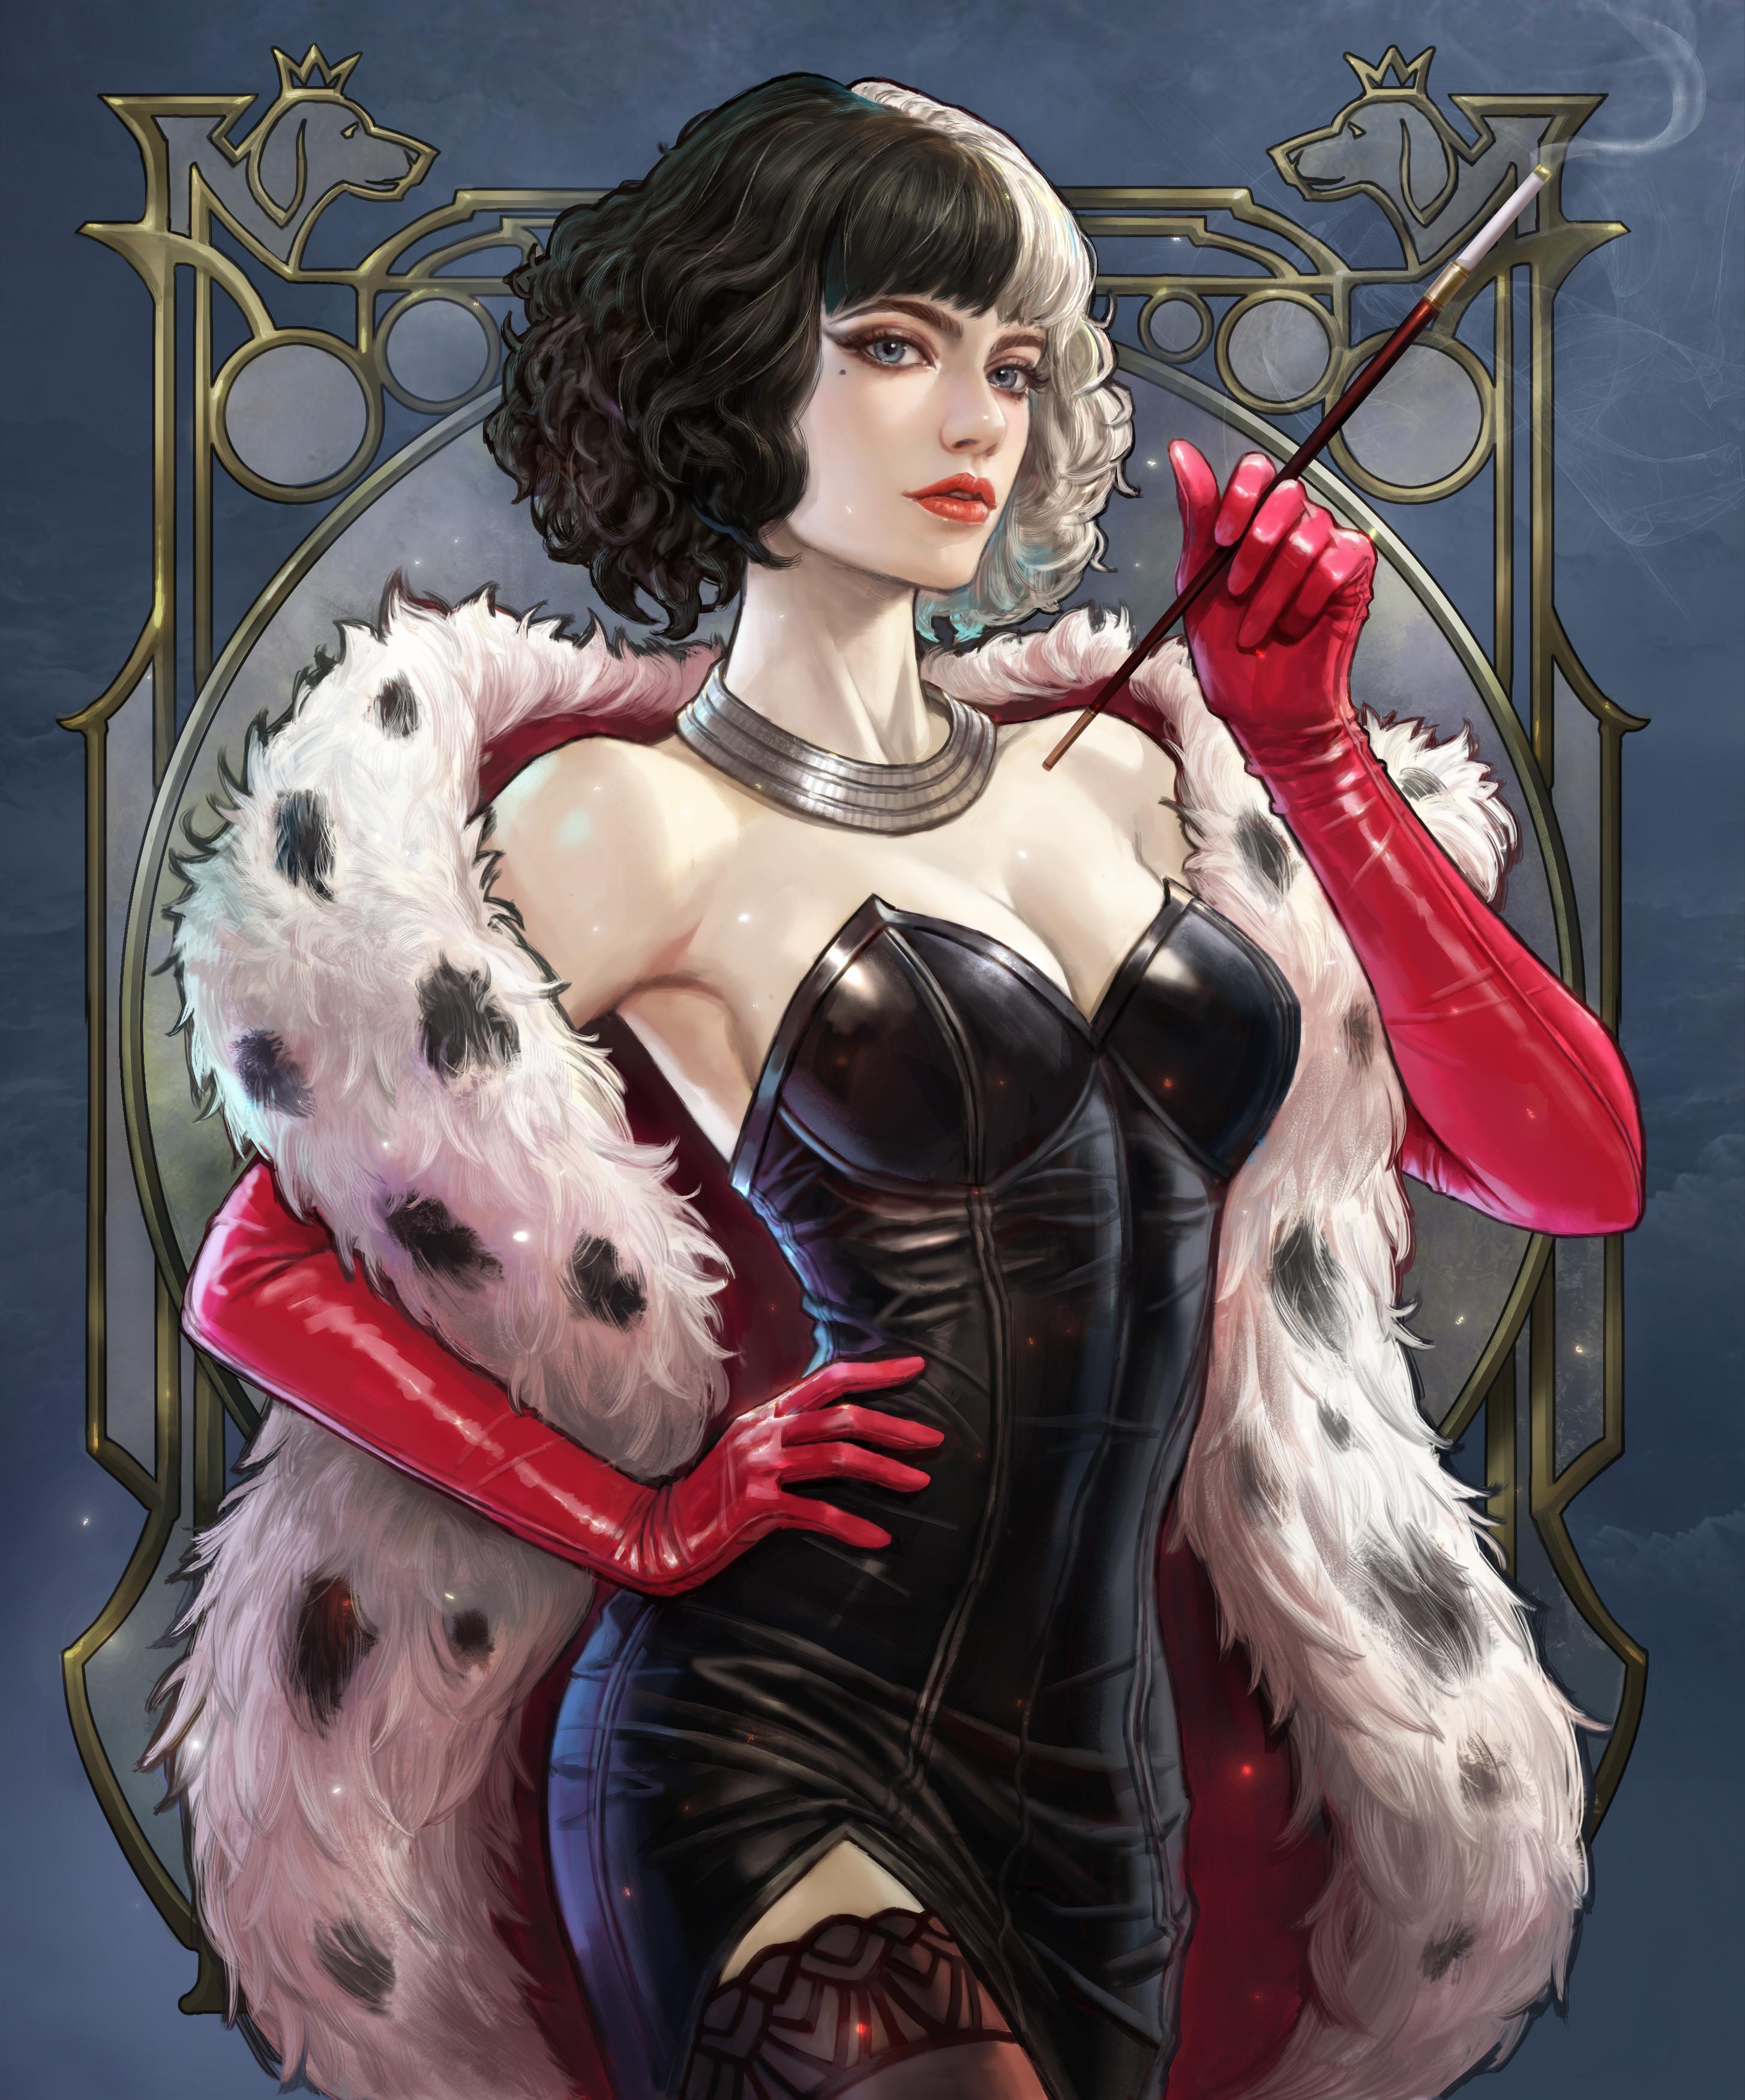 General 2908x3500 Kim Sung Hwan drawing Cruella de Vil women black clothing dress fur frame elbow gloves Emma Stone